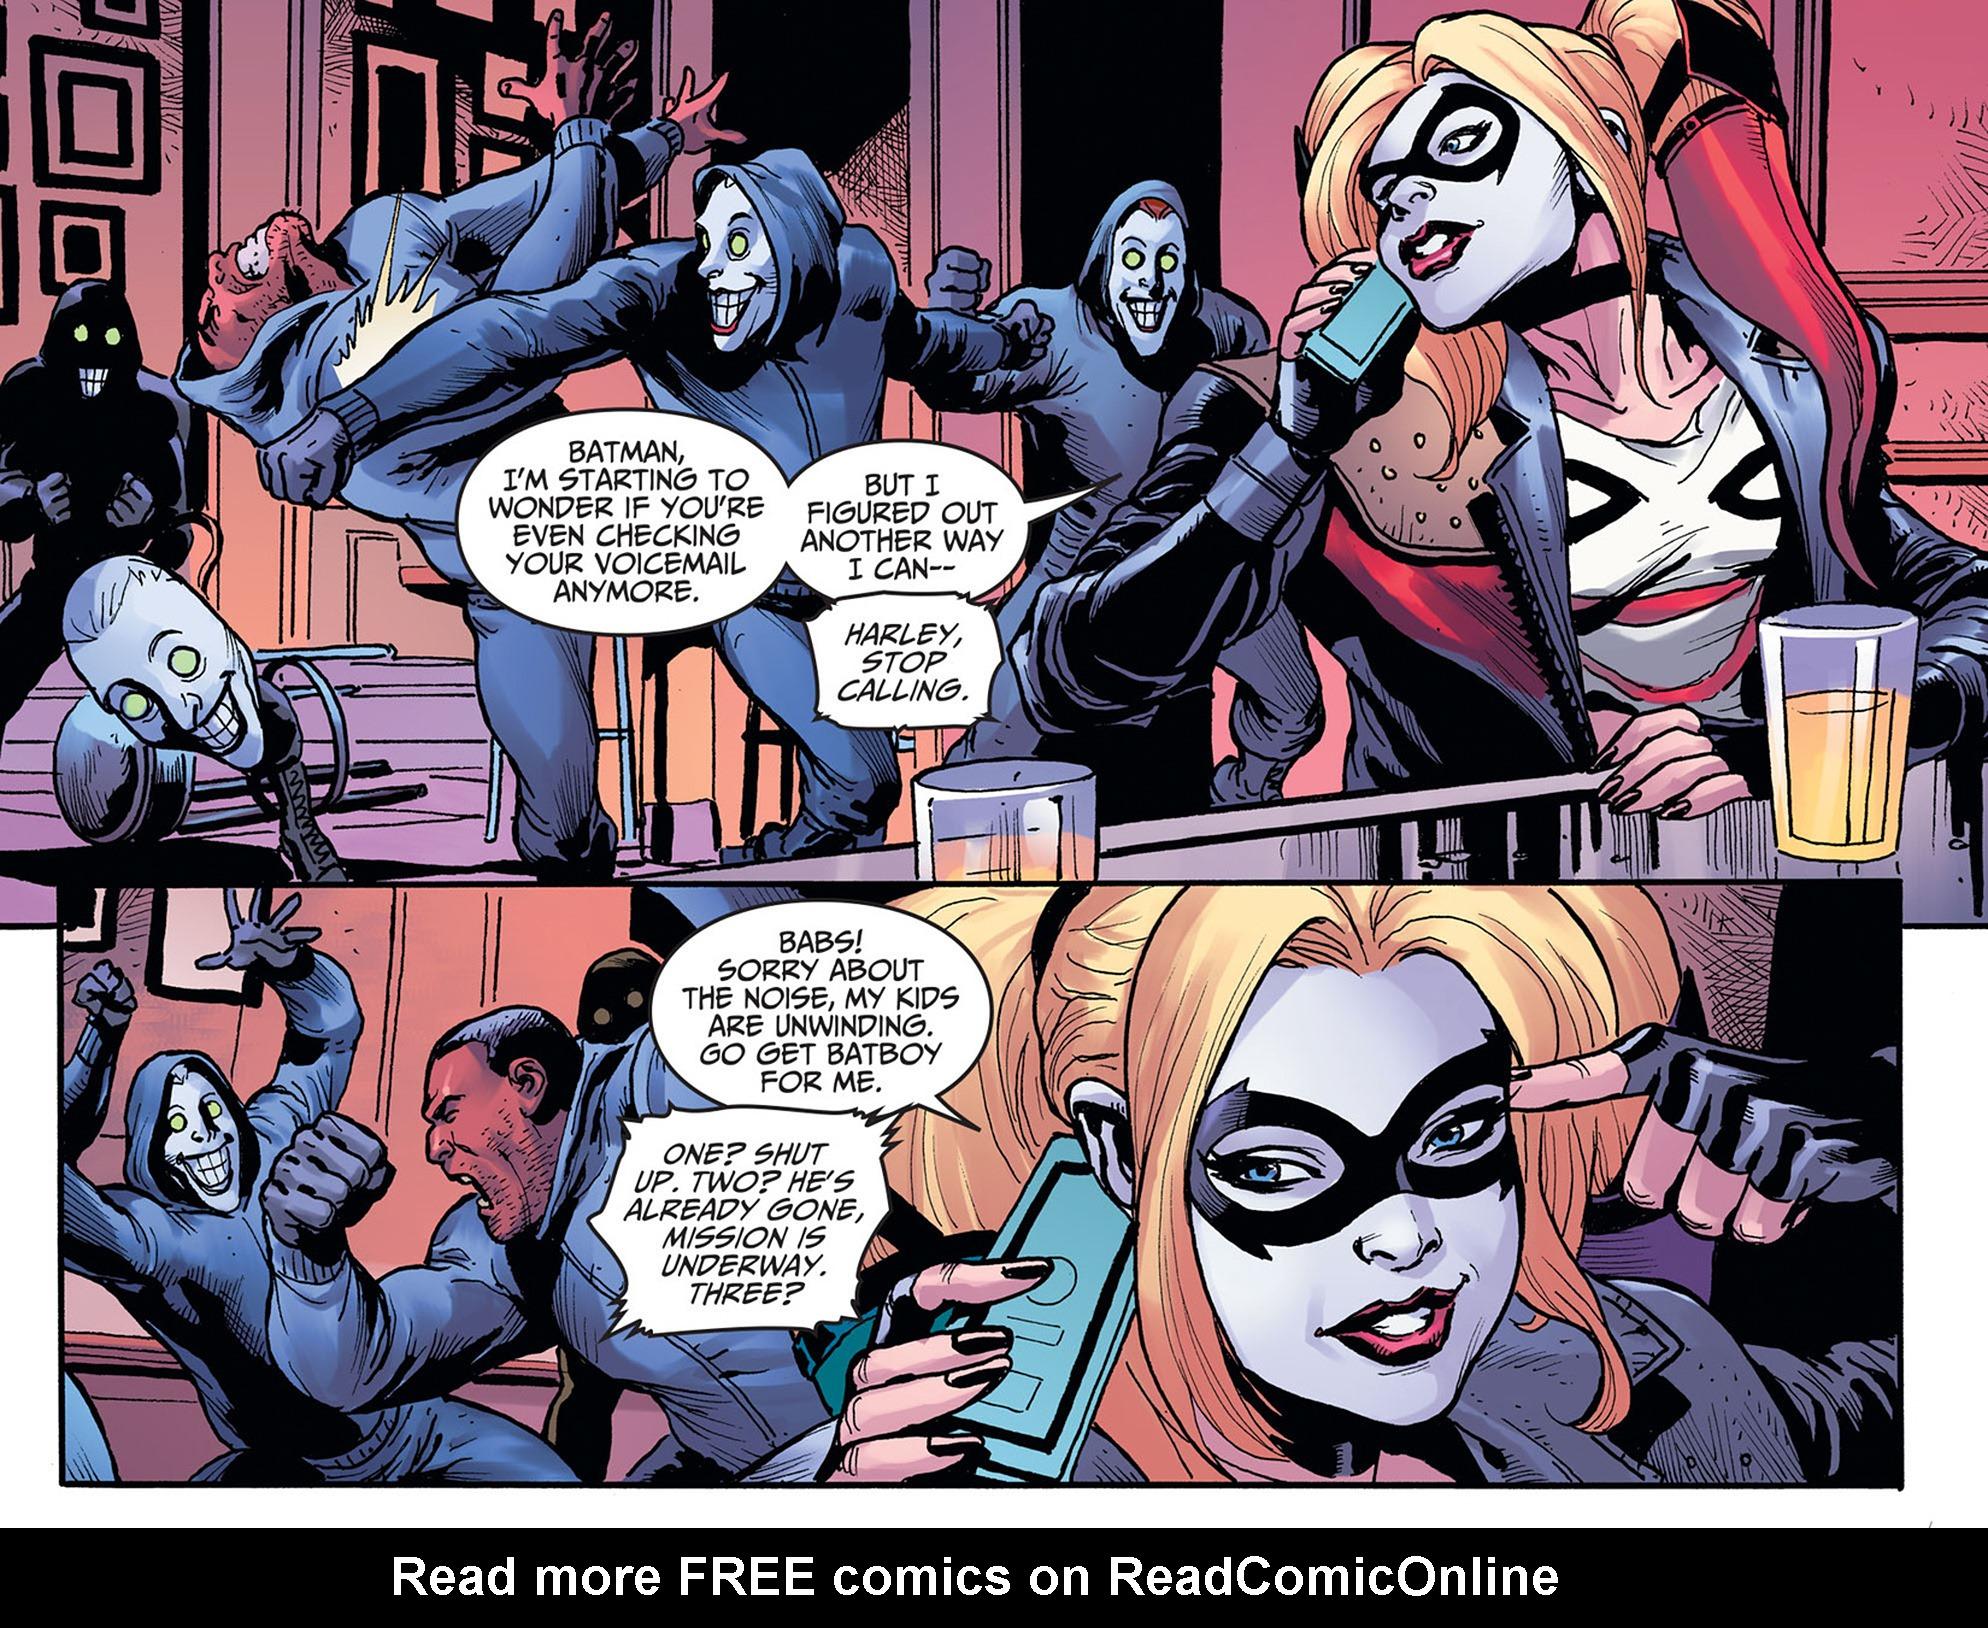 Read online Injustice: Ground Zero comic -  Issue #9 - 6